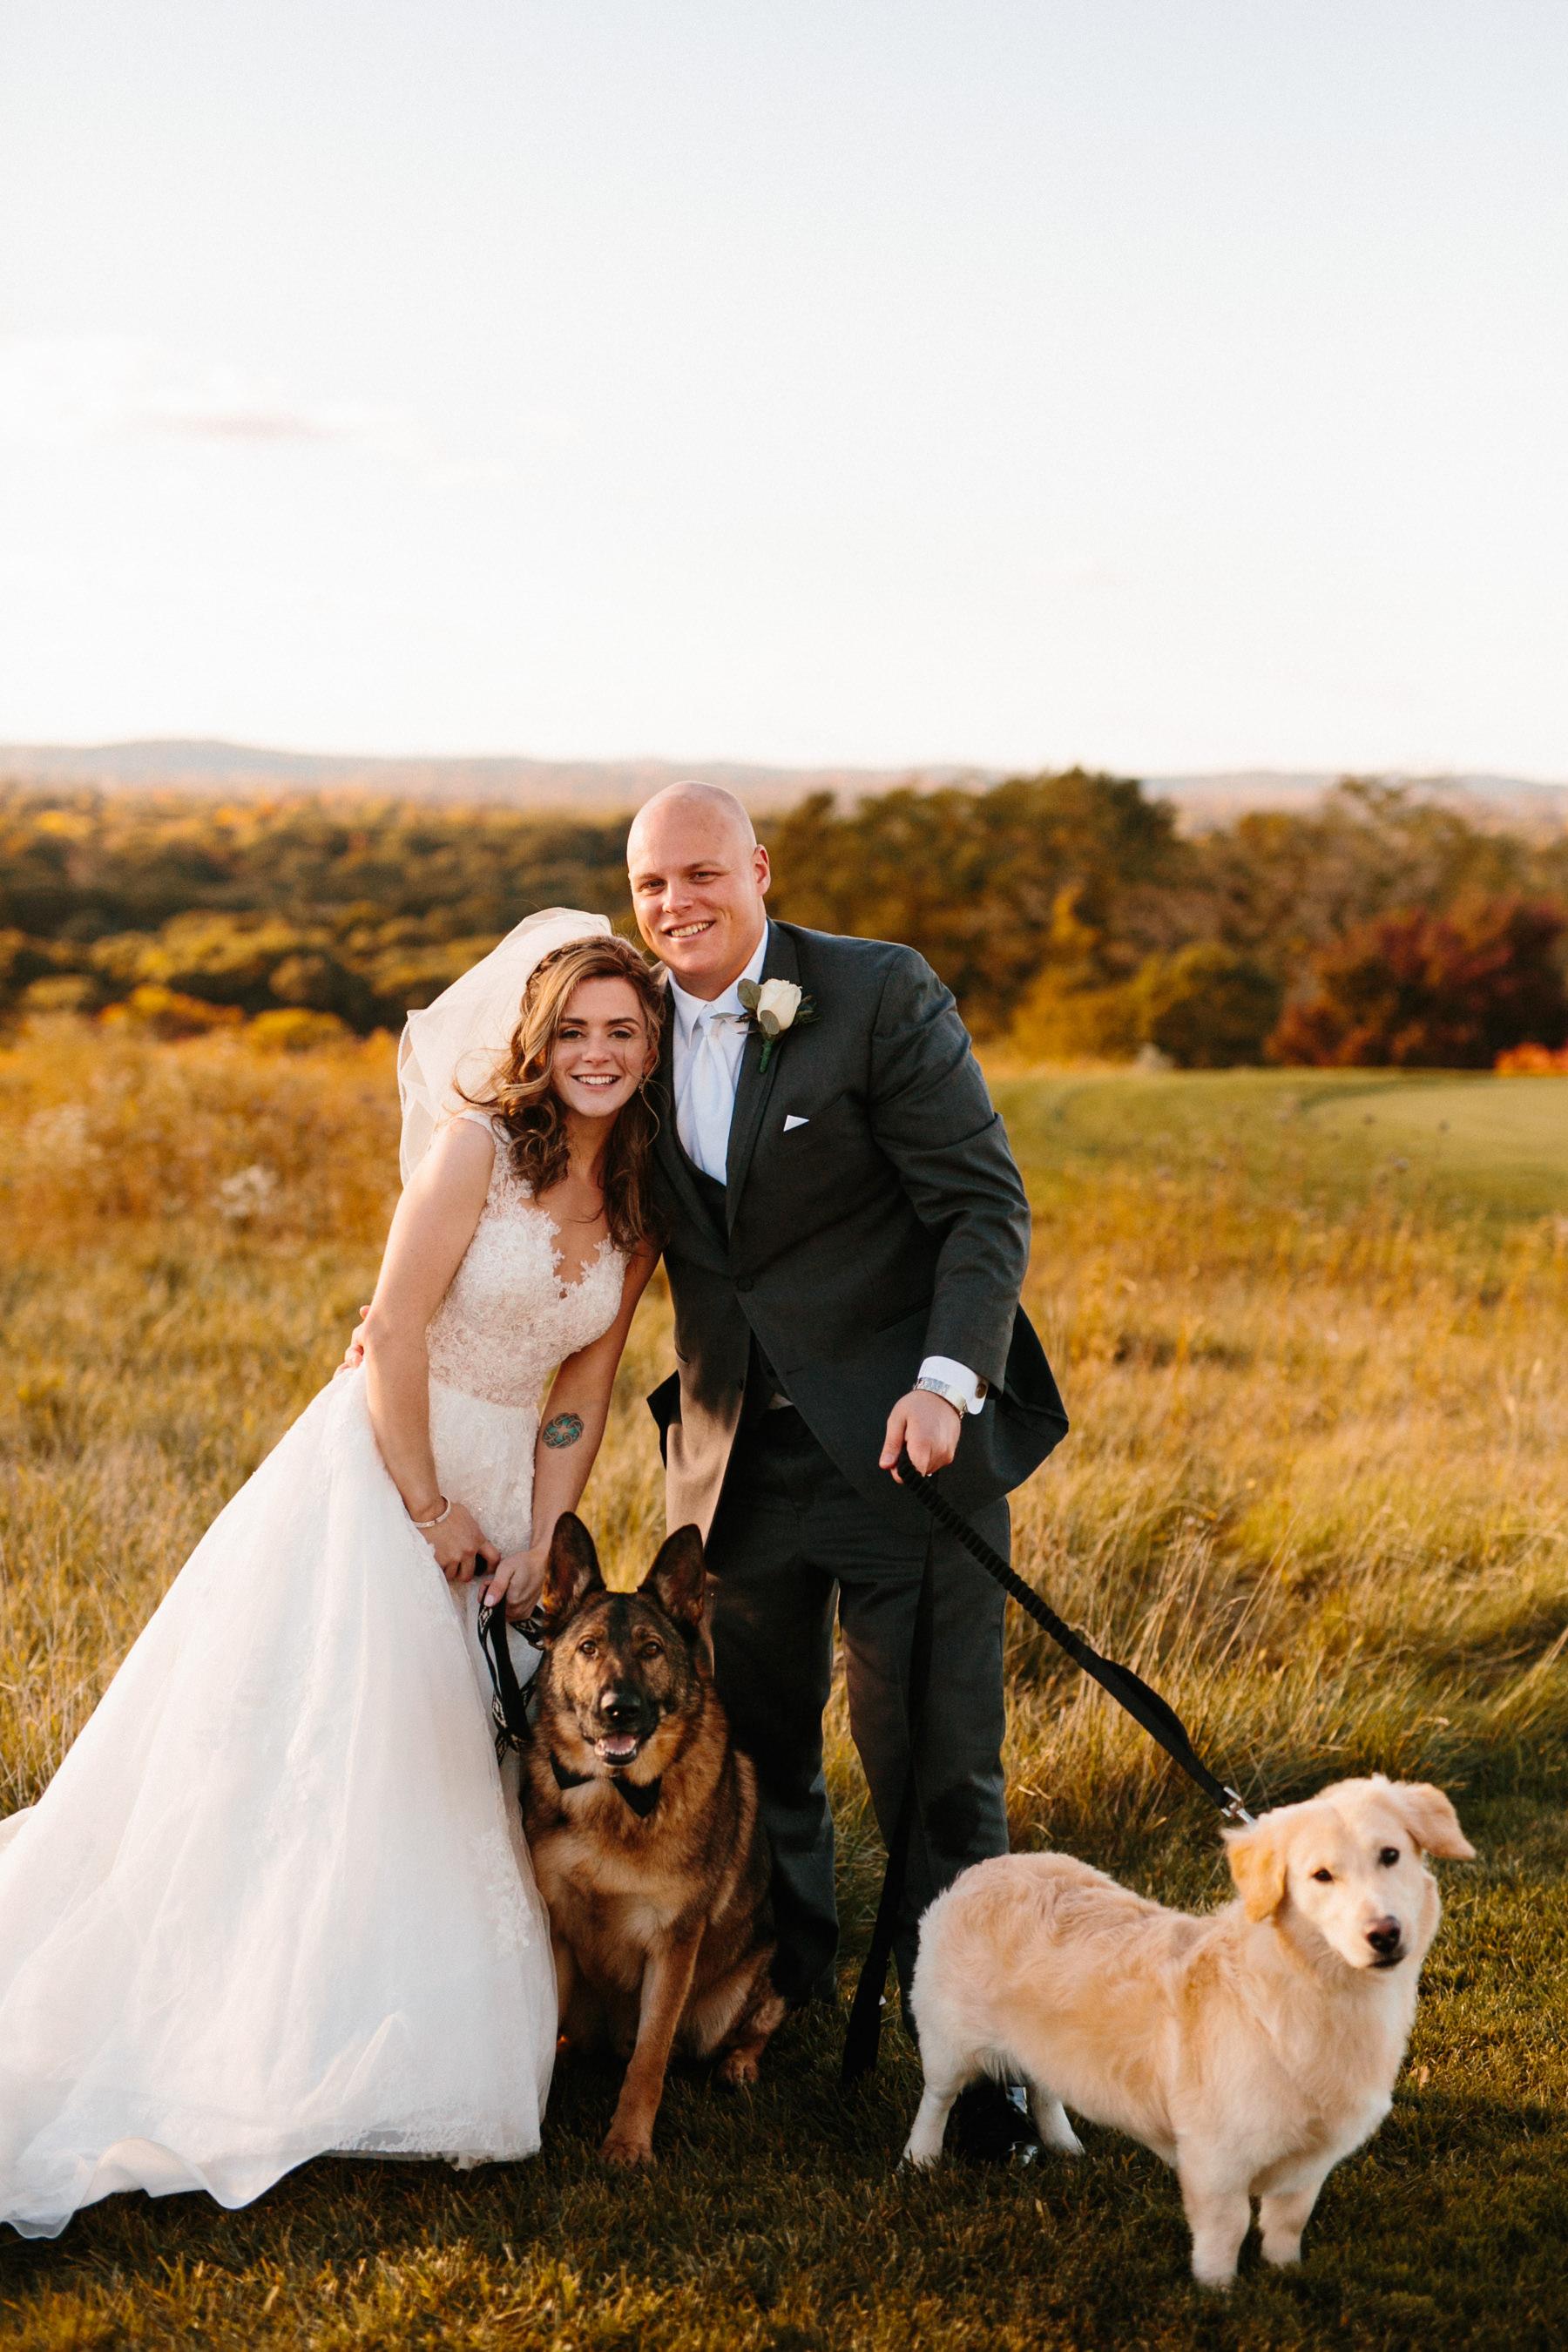 Quincy Ma Massachusetts Wedding Dedham Boston Granie Links Wedding New England Catholic Cathedral Liz Osban Photography 58.jpg